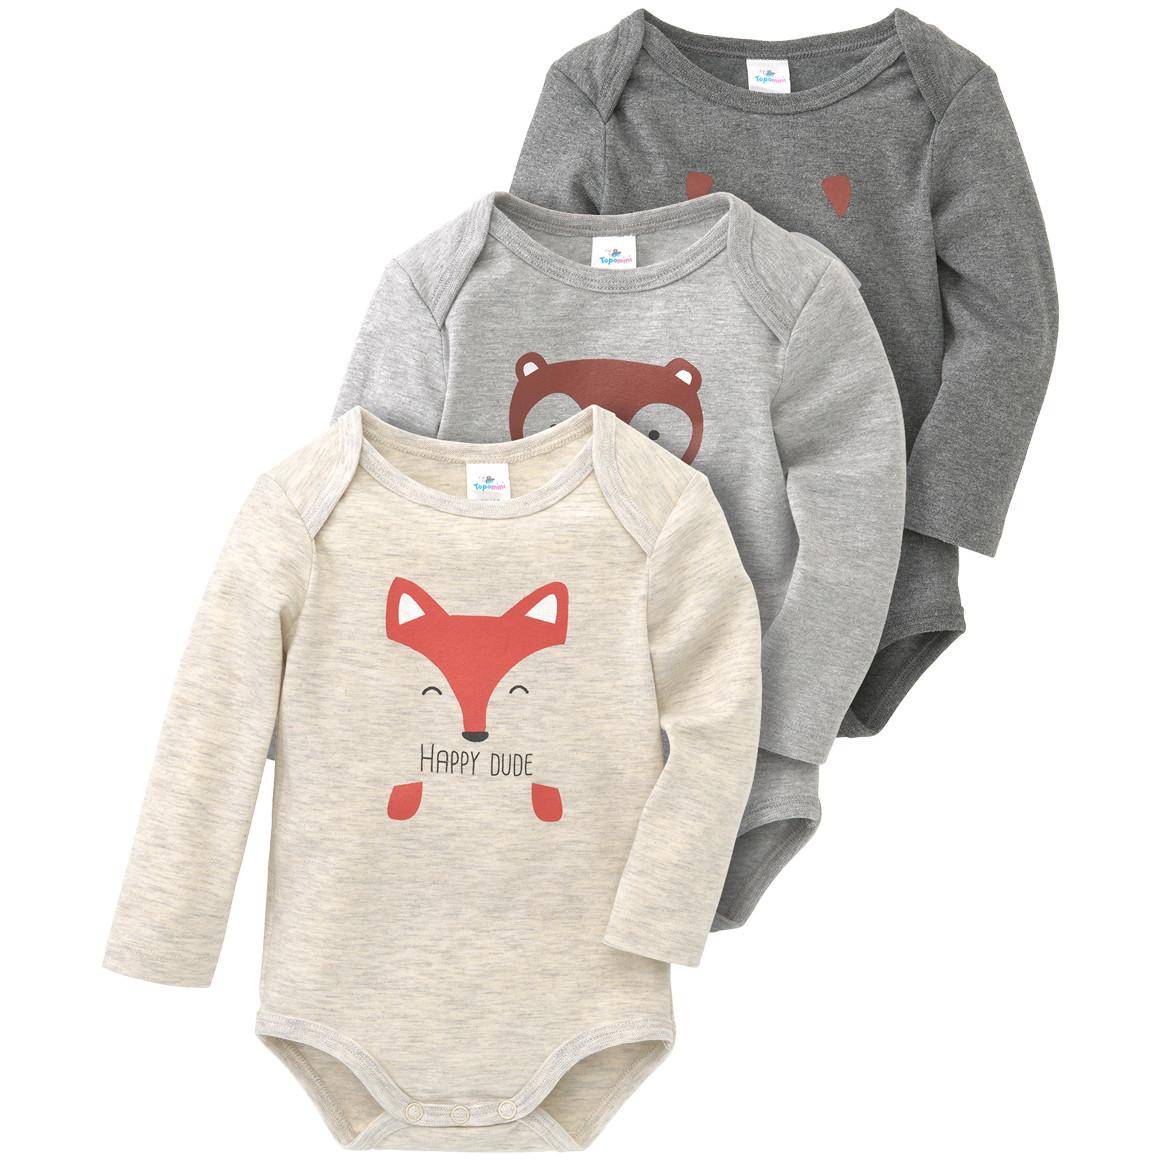 Babywaesche - 3 Baby Langarmbodys in verschiedenen Dessins - Onlineshop Ernstings family